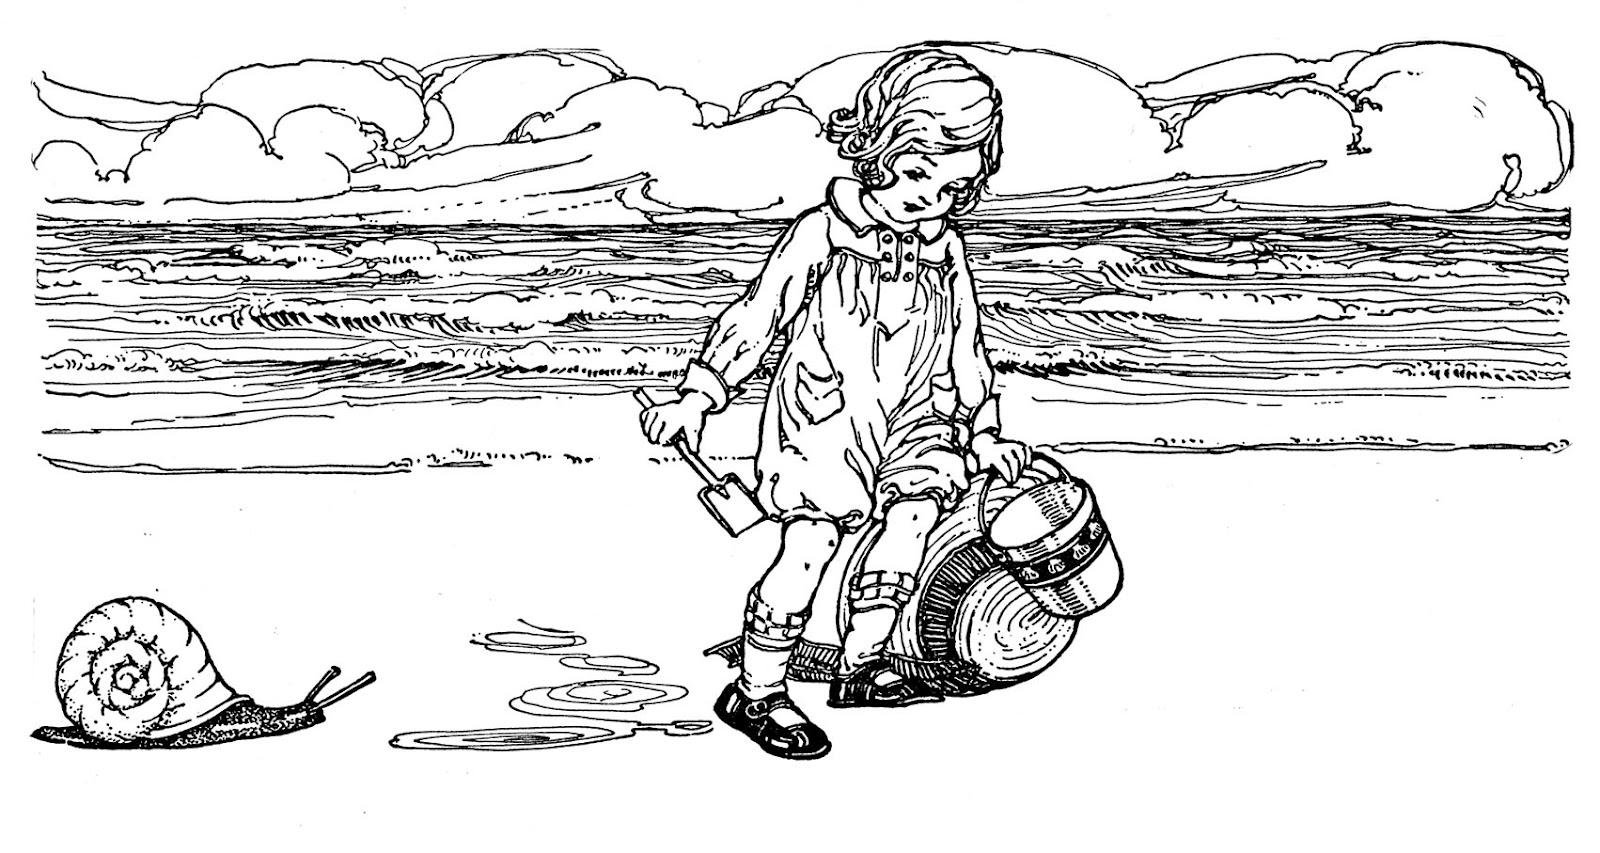 Vintage beach clipart free stock Free Vintage Beach Cliparts, Download Free Clip Art, Free ... free stock